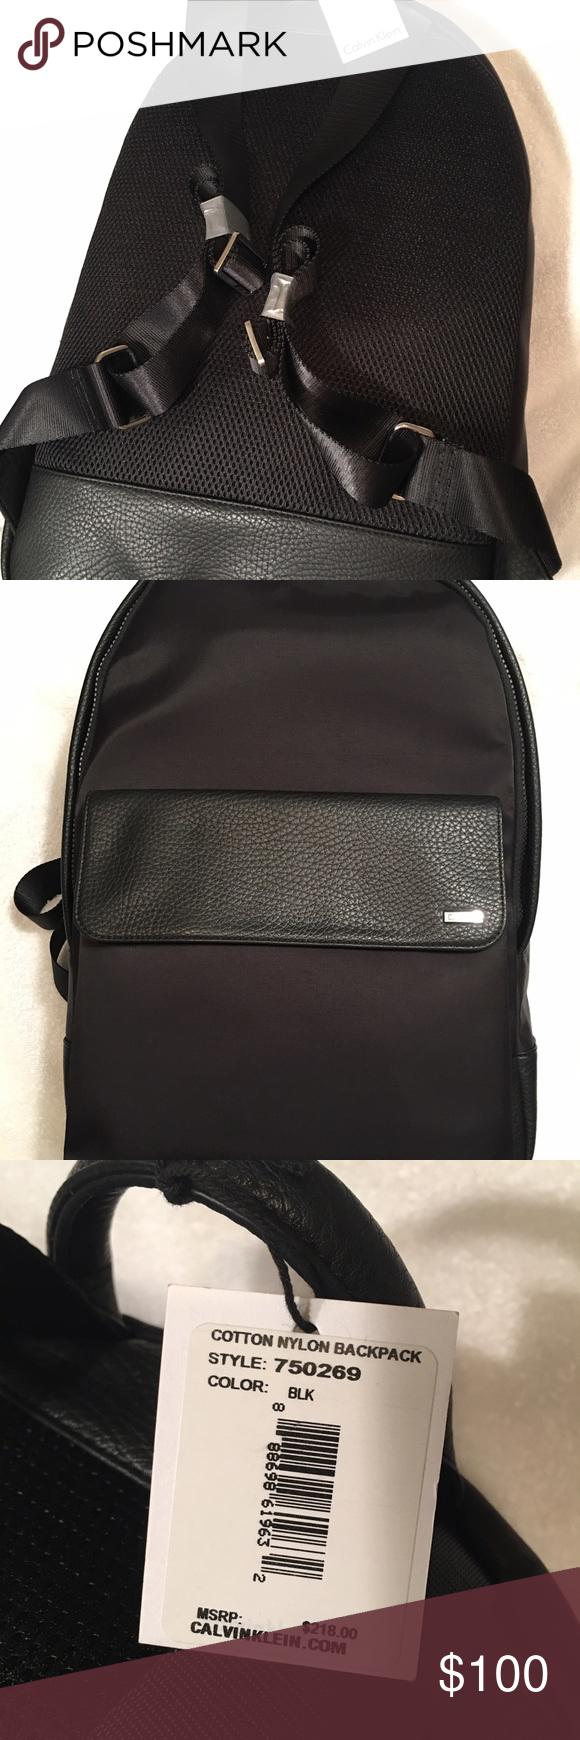 Calvin Klein athletic nylon leather backpack calvin klein unisex athletic  nylon leather backpack black 3f6da29e2ca63